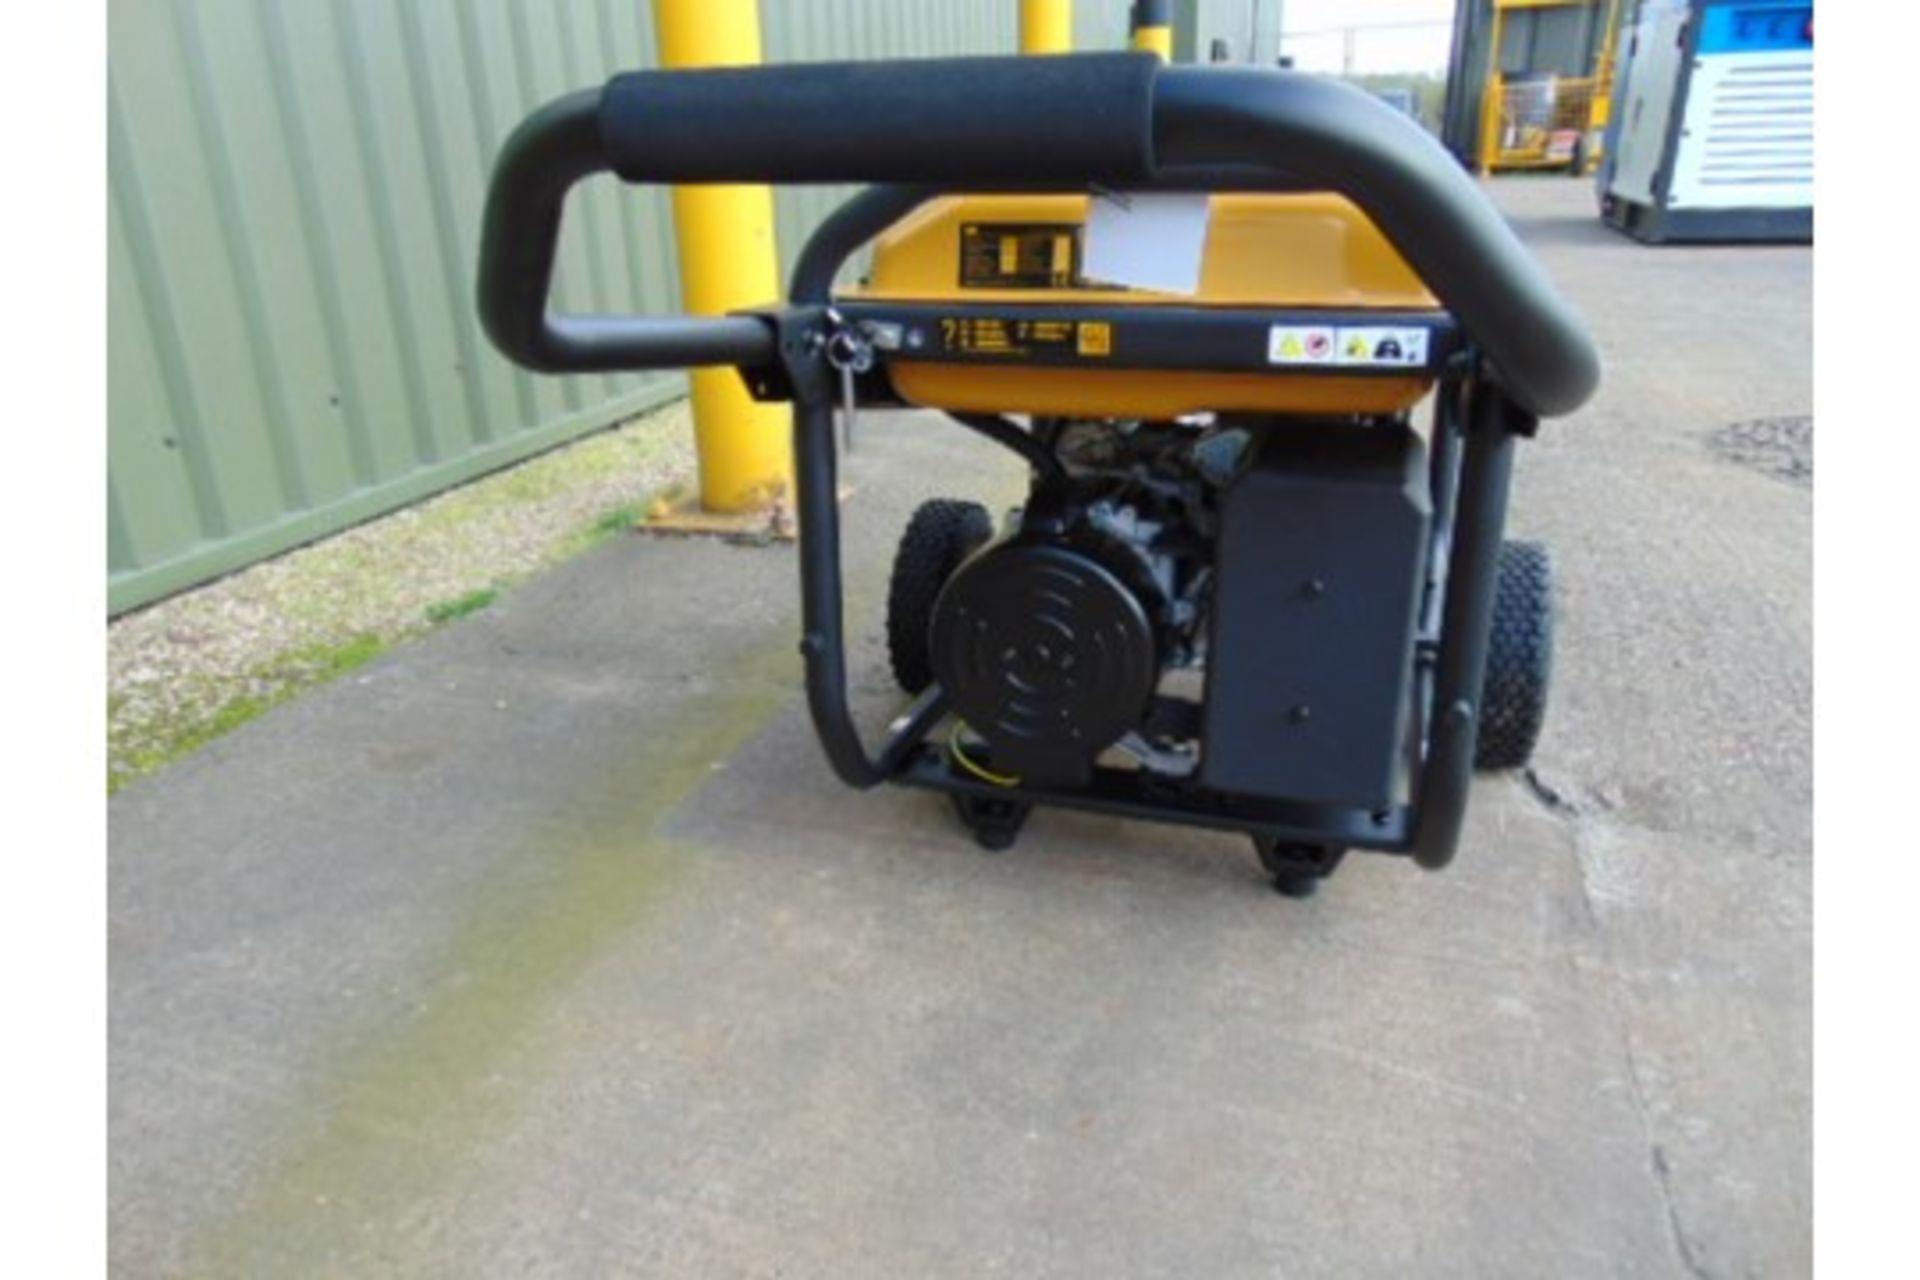 Lot 27197 - UNISSUED Caterpillar RP4400 Industrial Petrol Generator Set